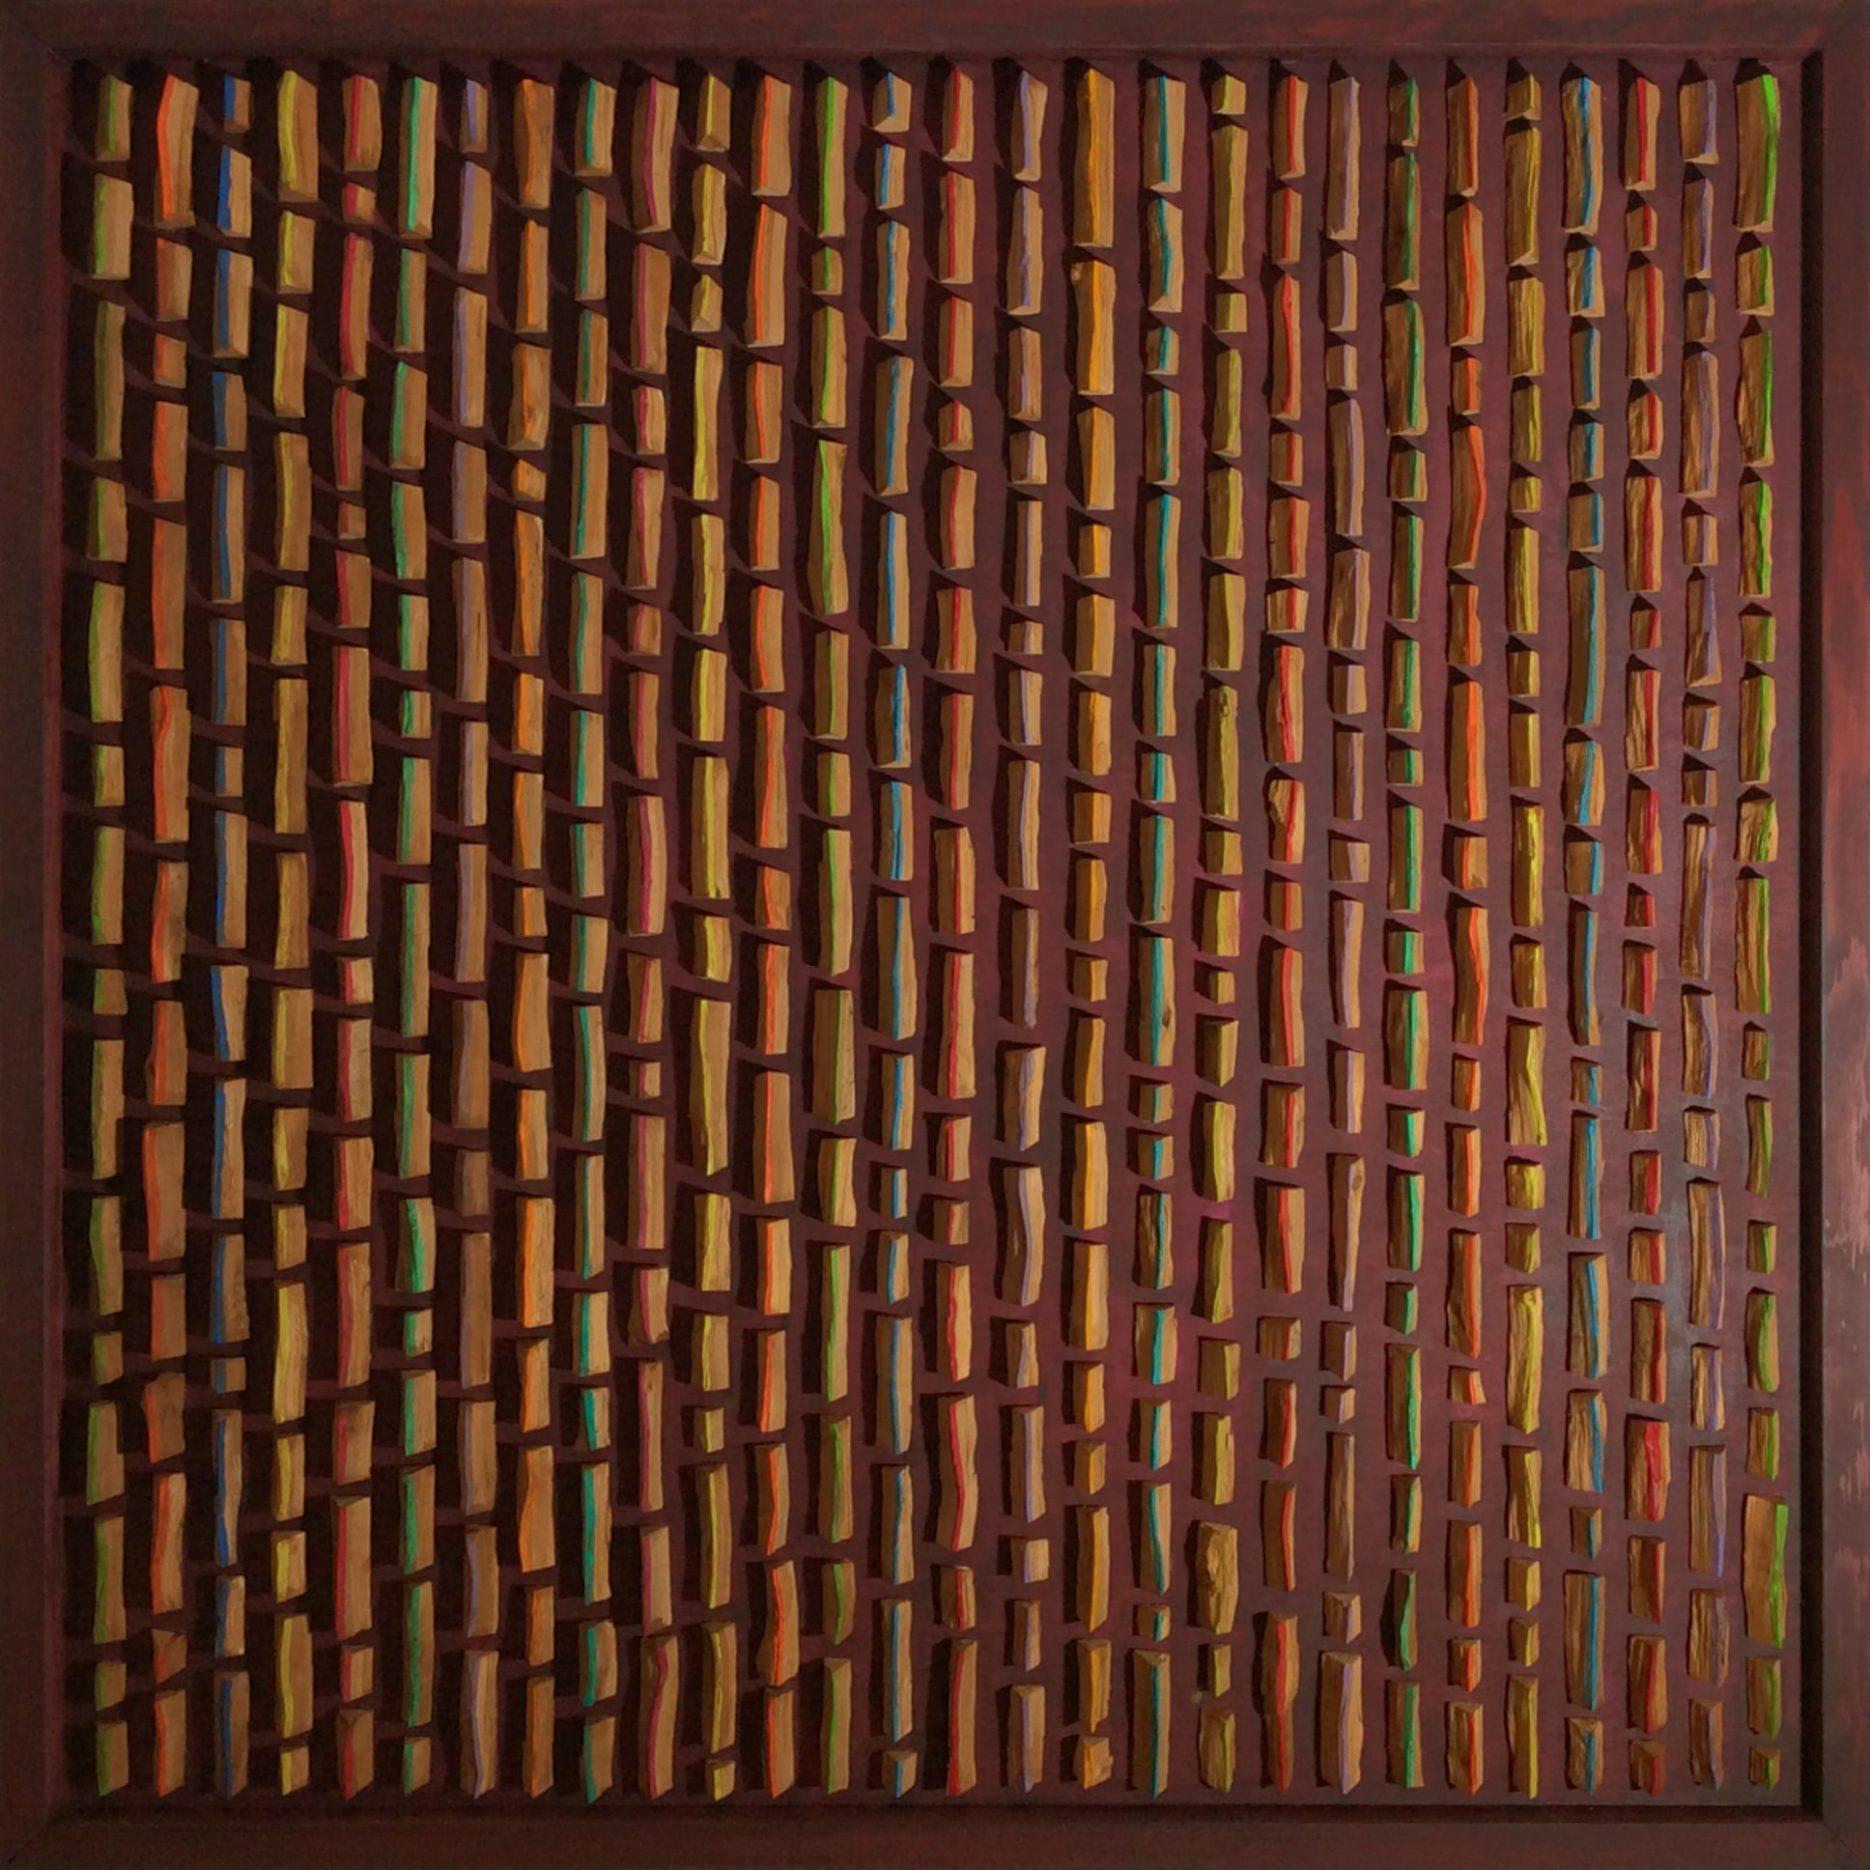 Bild 1,00 x 1,00m – Buchenholzelemente (2017)